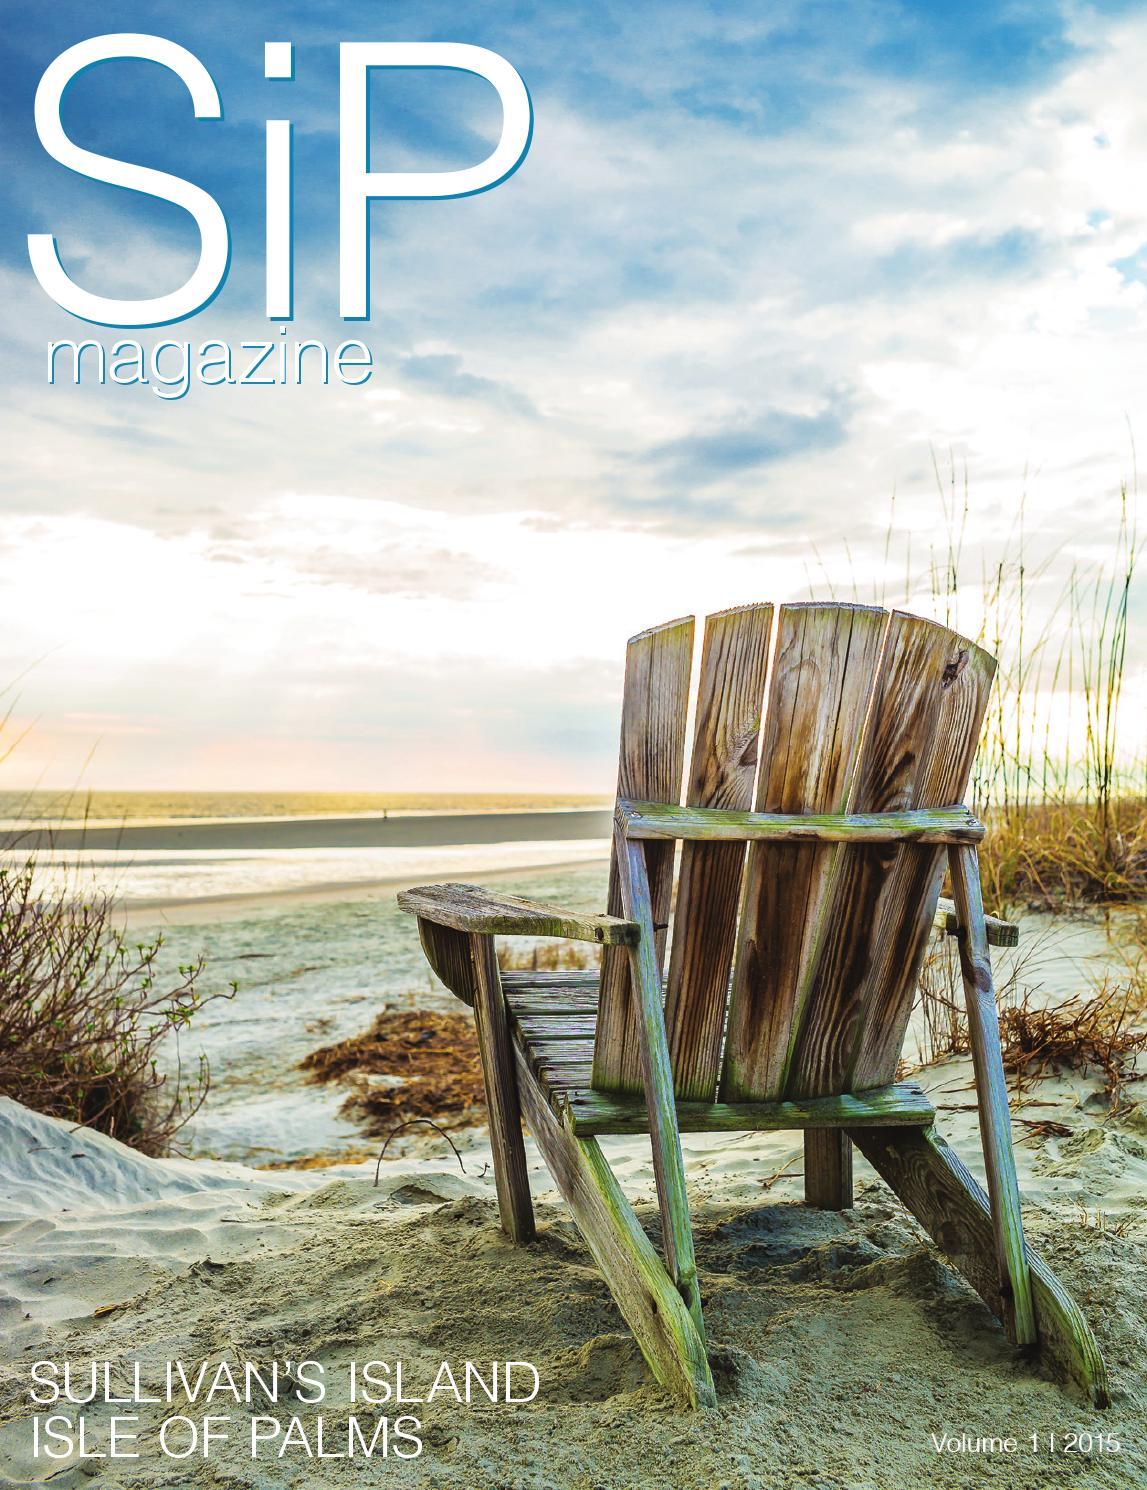 Sip magazine 2015 by sip magazine issuu nvjuhfo Choice Image